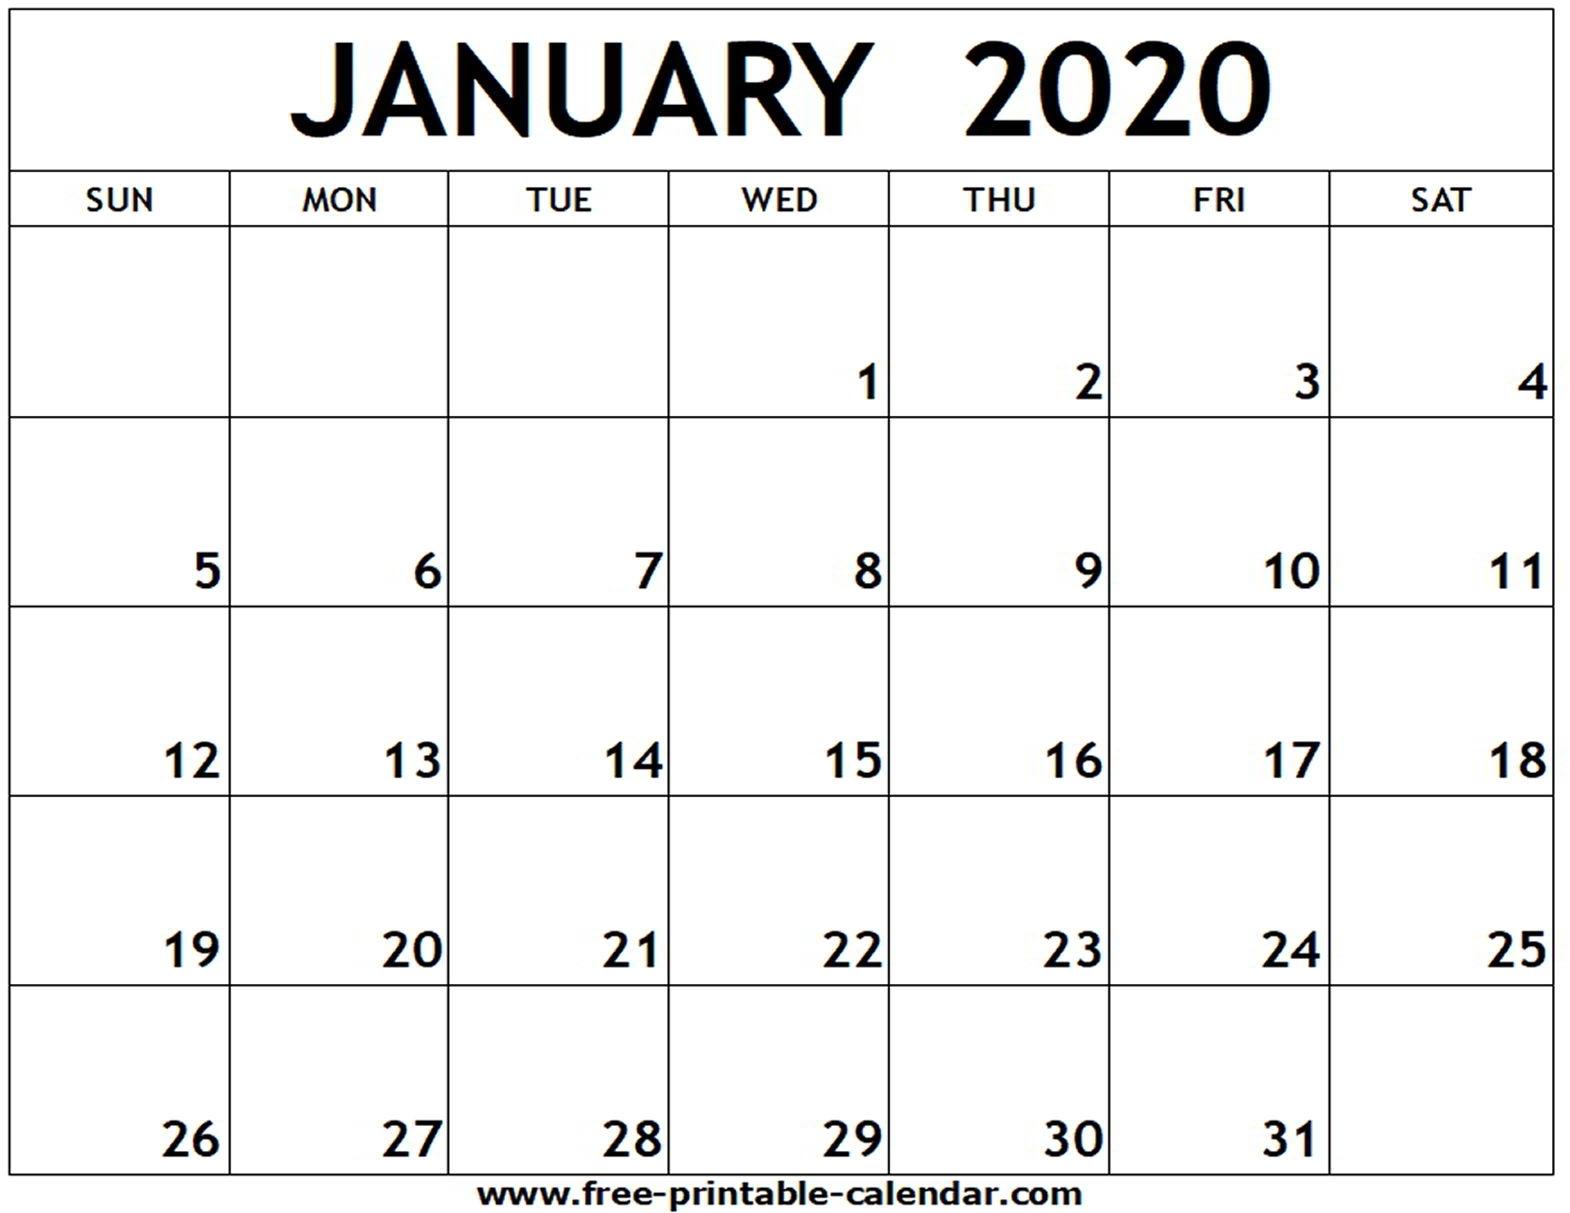 January 2020 Printable Calendar - Free-Printable-Calendar